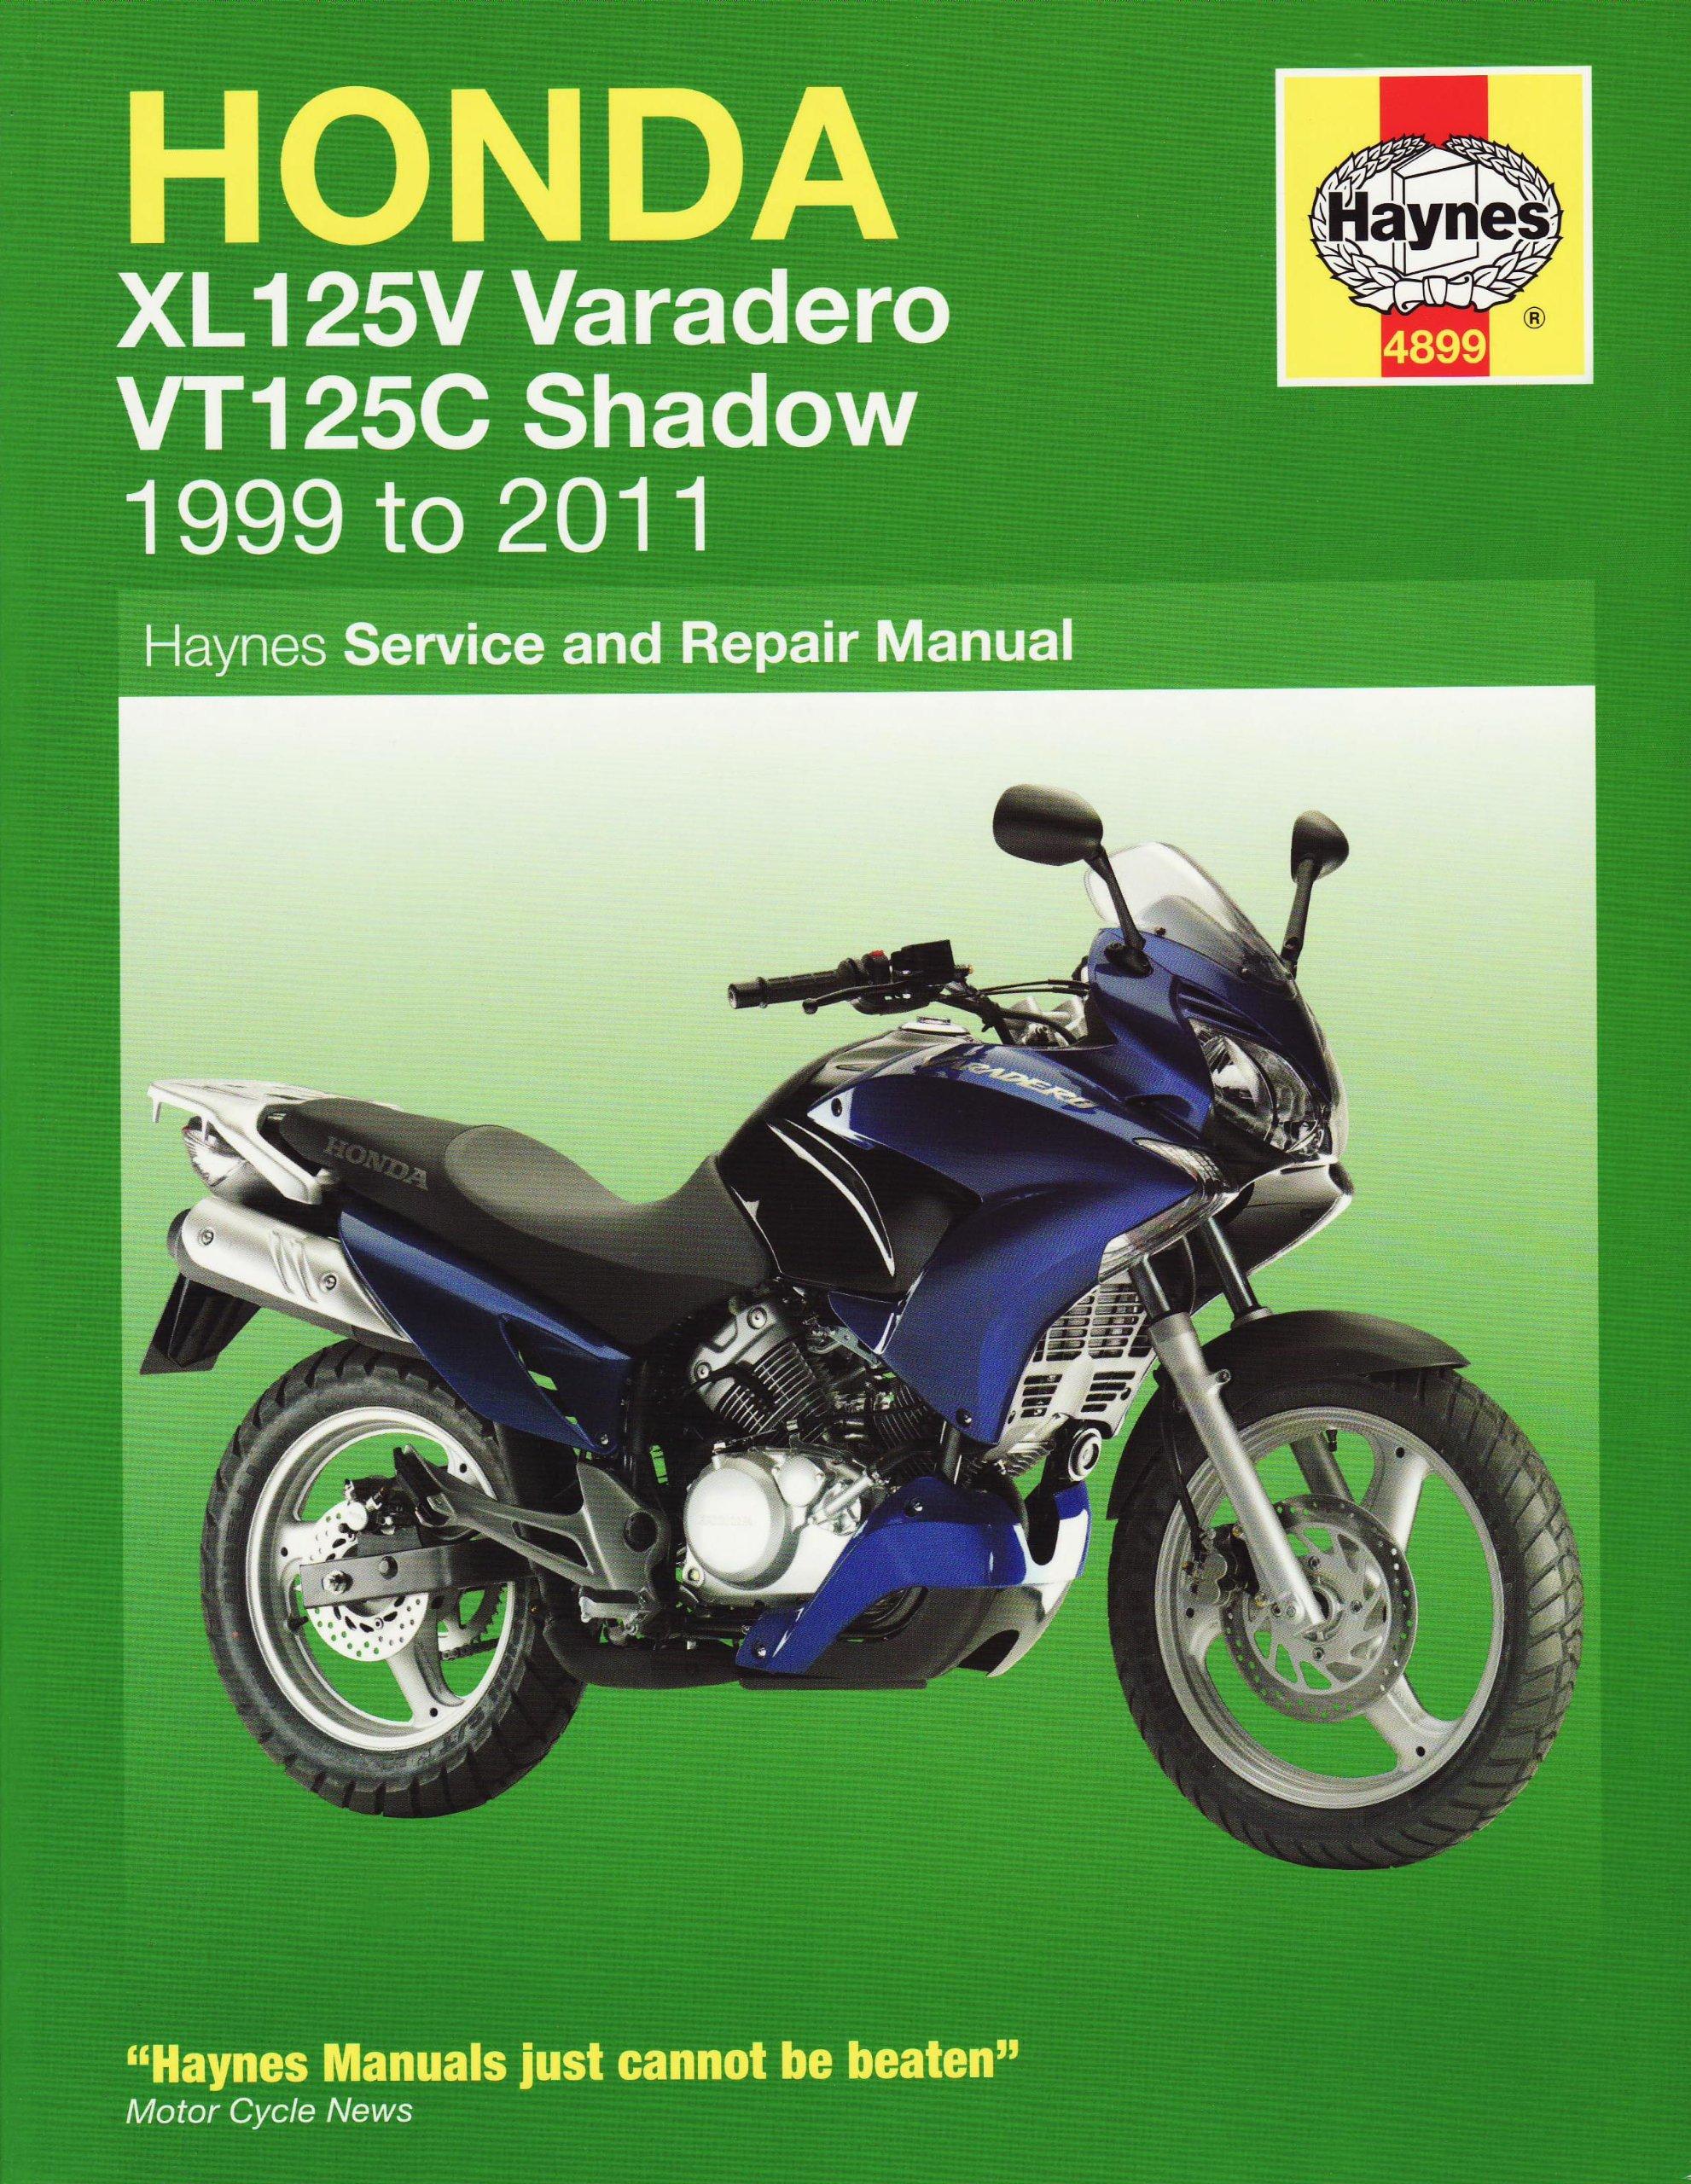 Honda XL125V & VT125C 1999 - 2011 (Haynes Motorcycle Manuals):  Amazon.co.uk: Anon: 9781844258994: Books